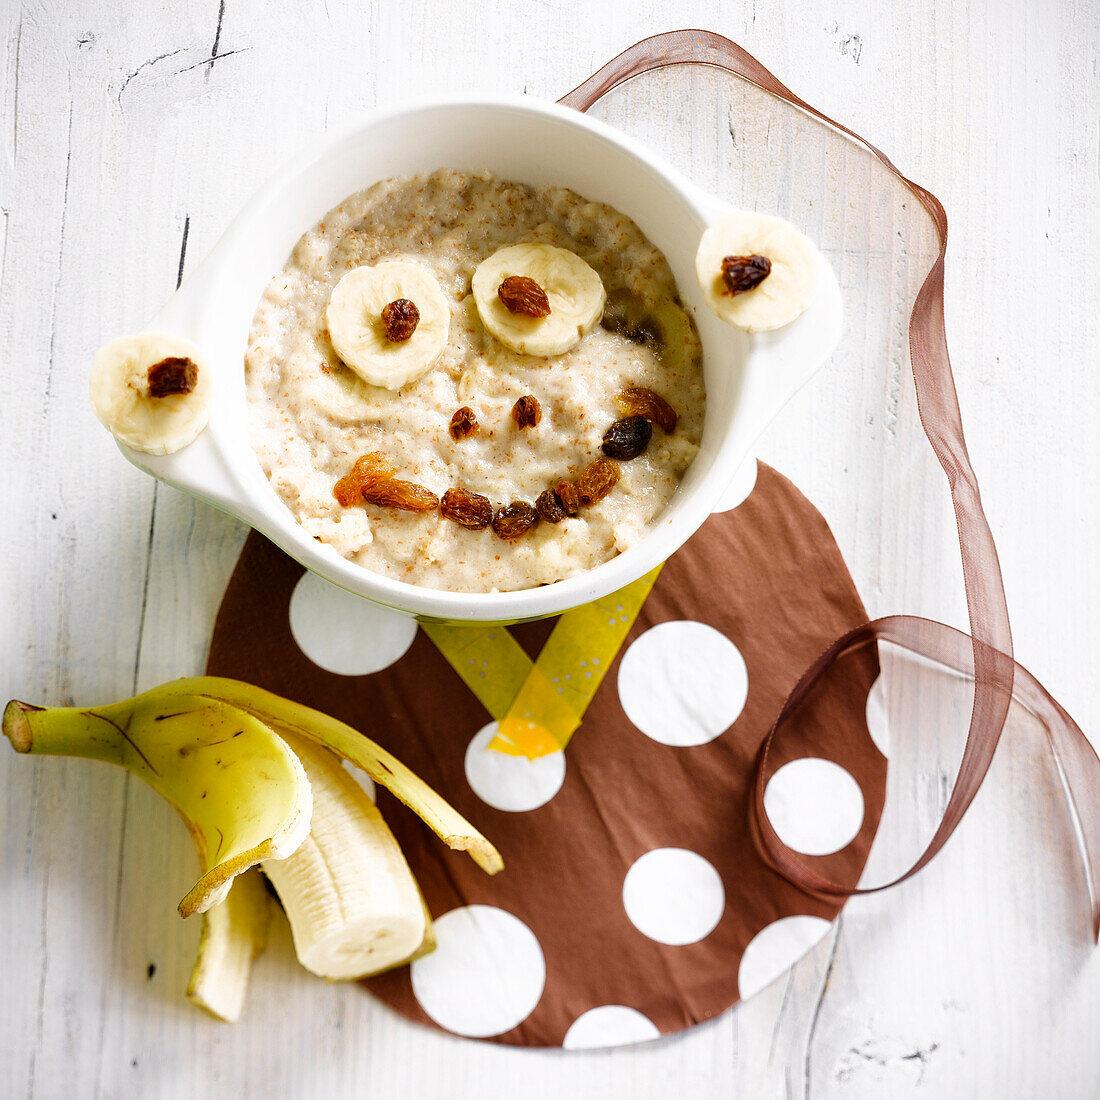 Monky face porrindge with bananas and raisins